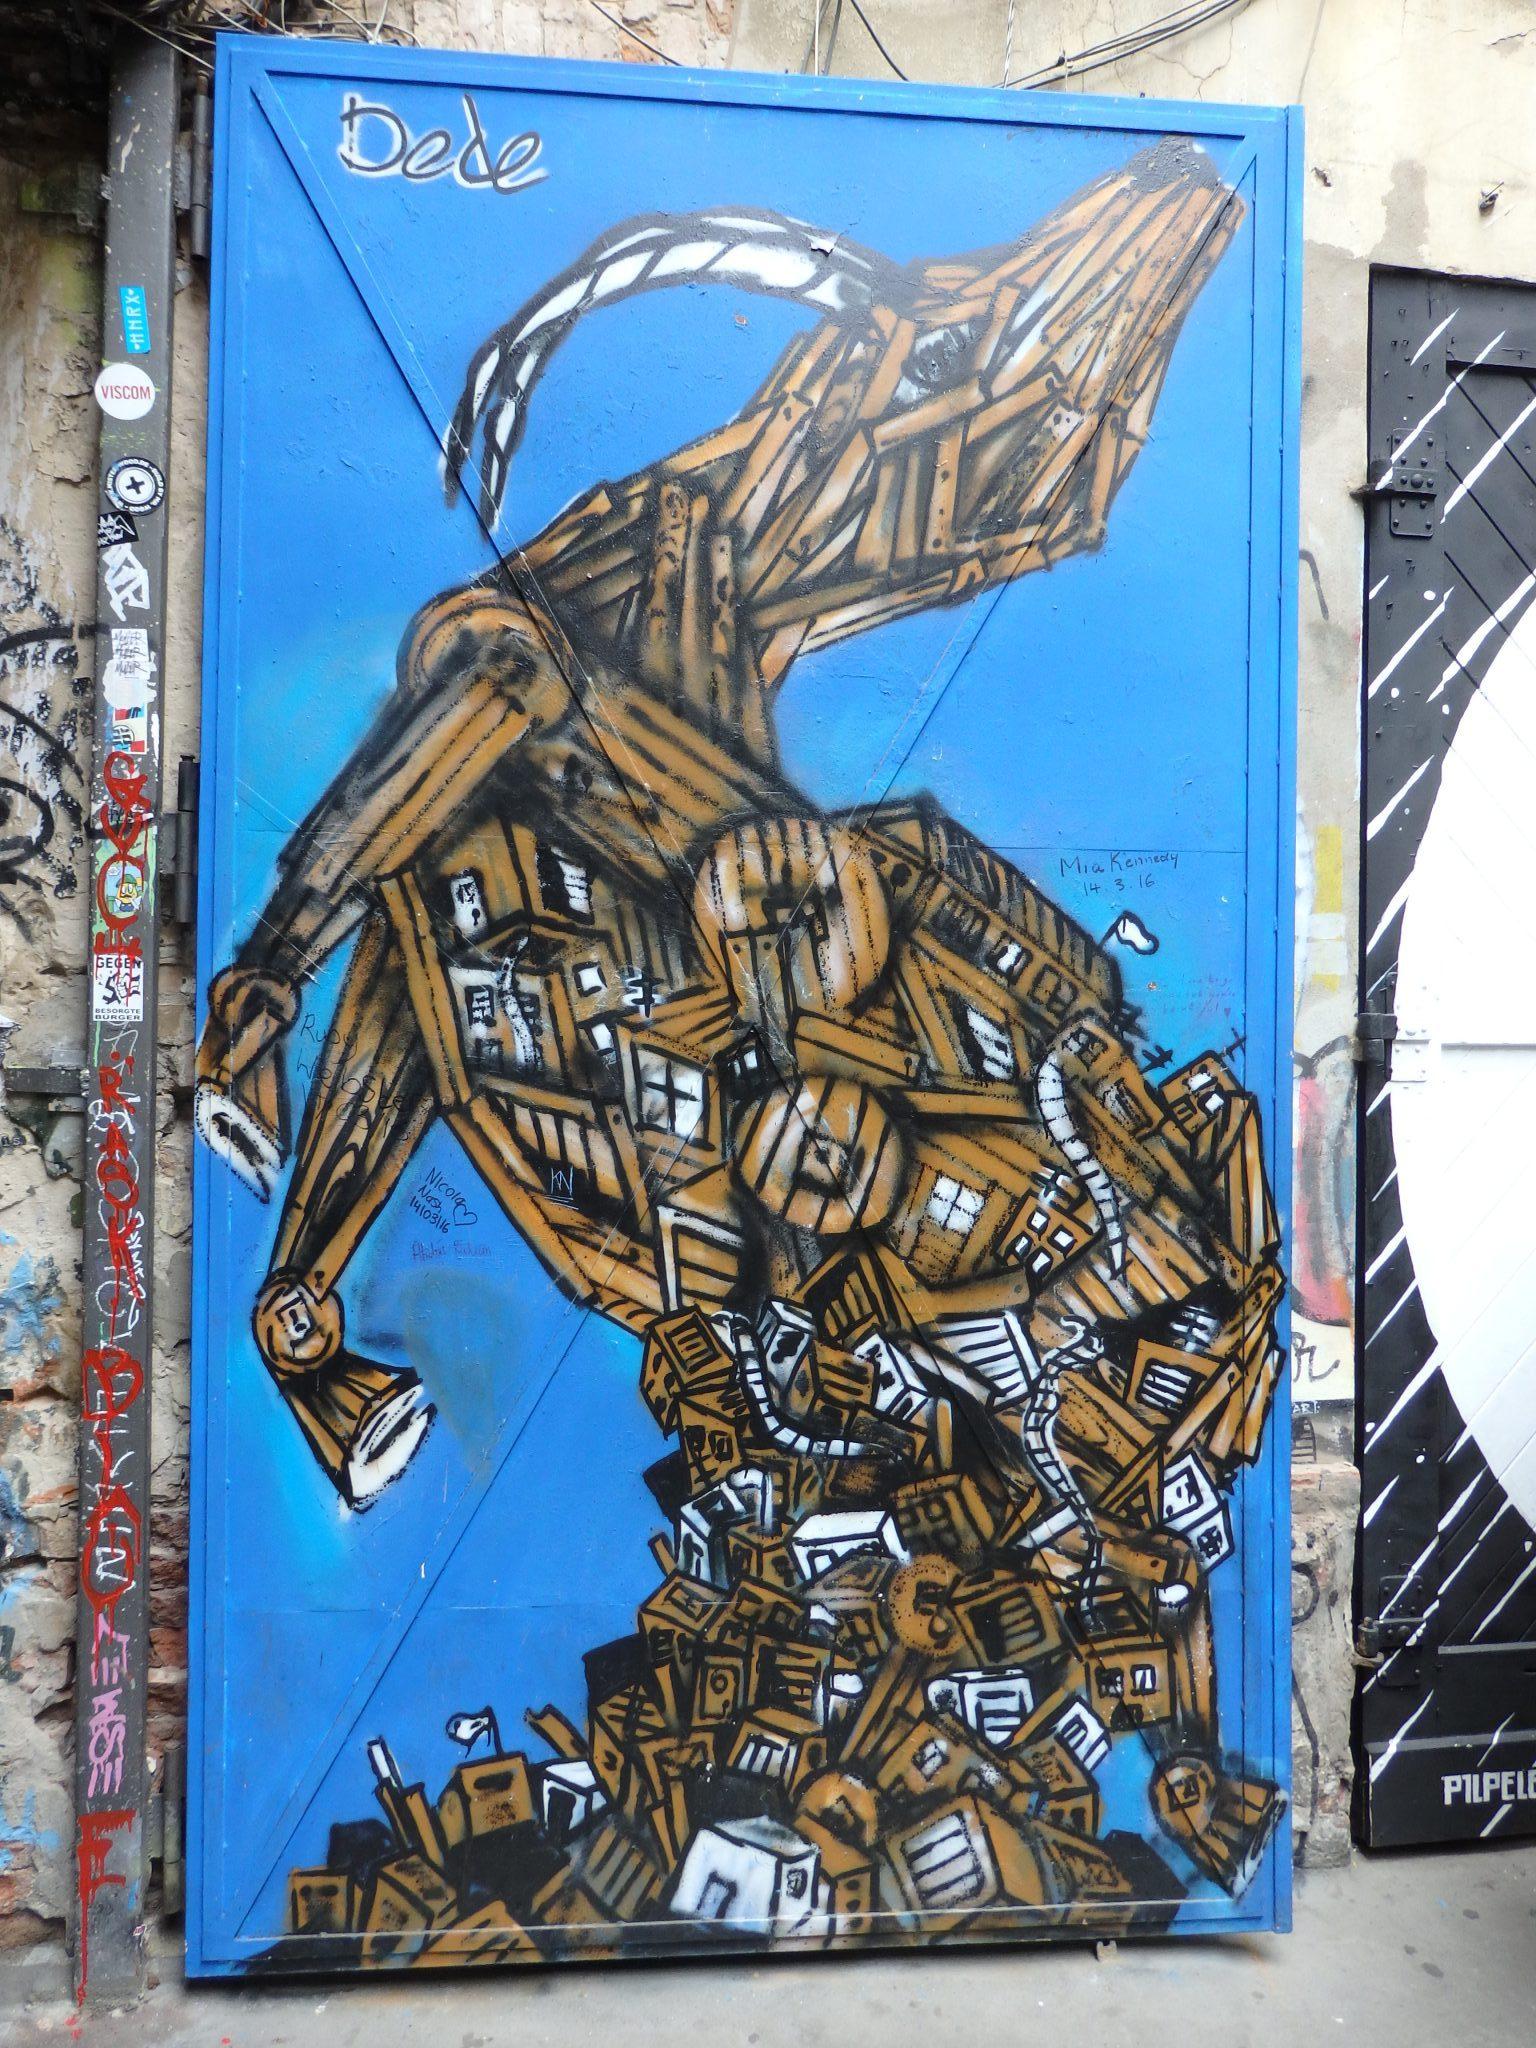 Street art, by Dede, an Israeli artist, at Haus Schwarzenberg, Berlin